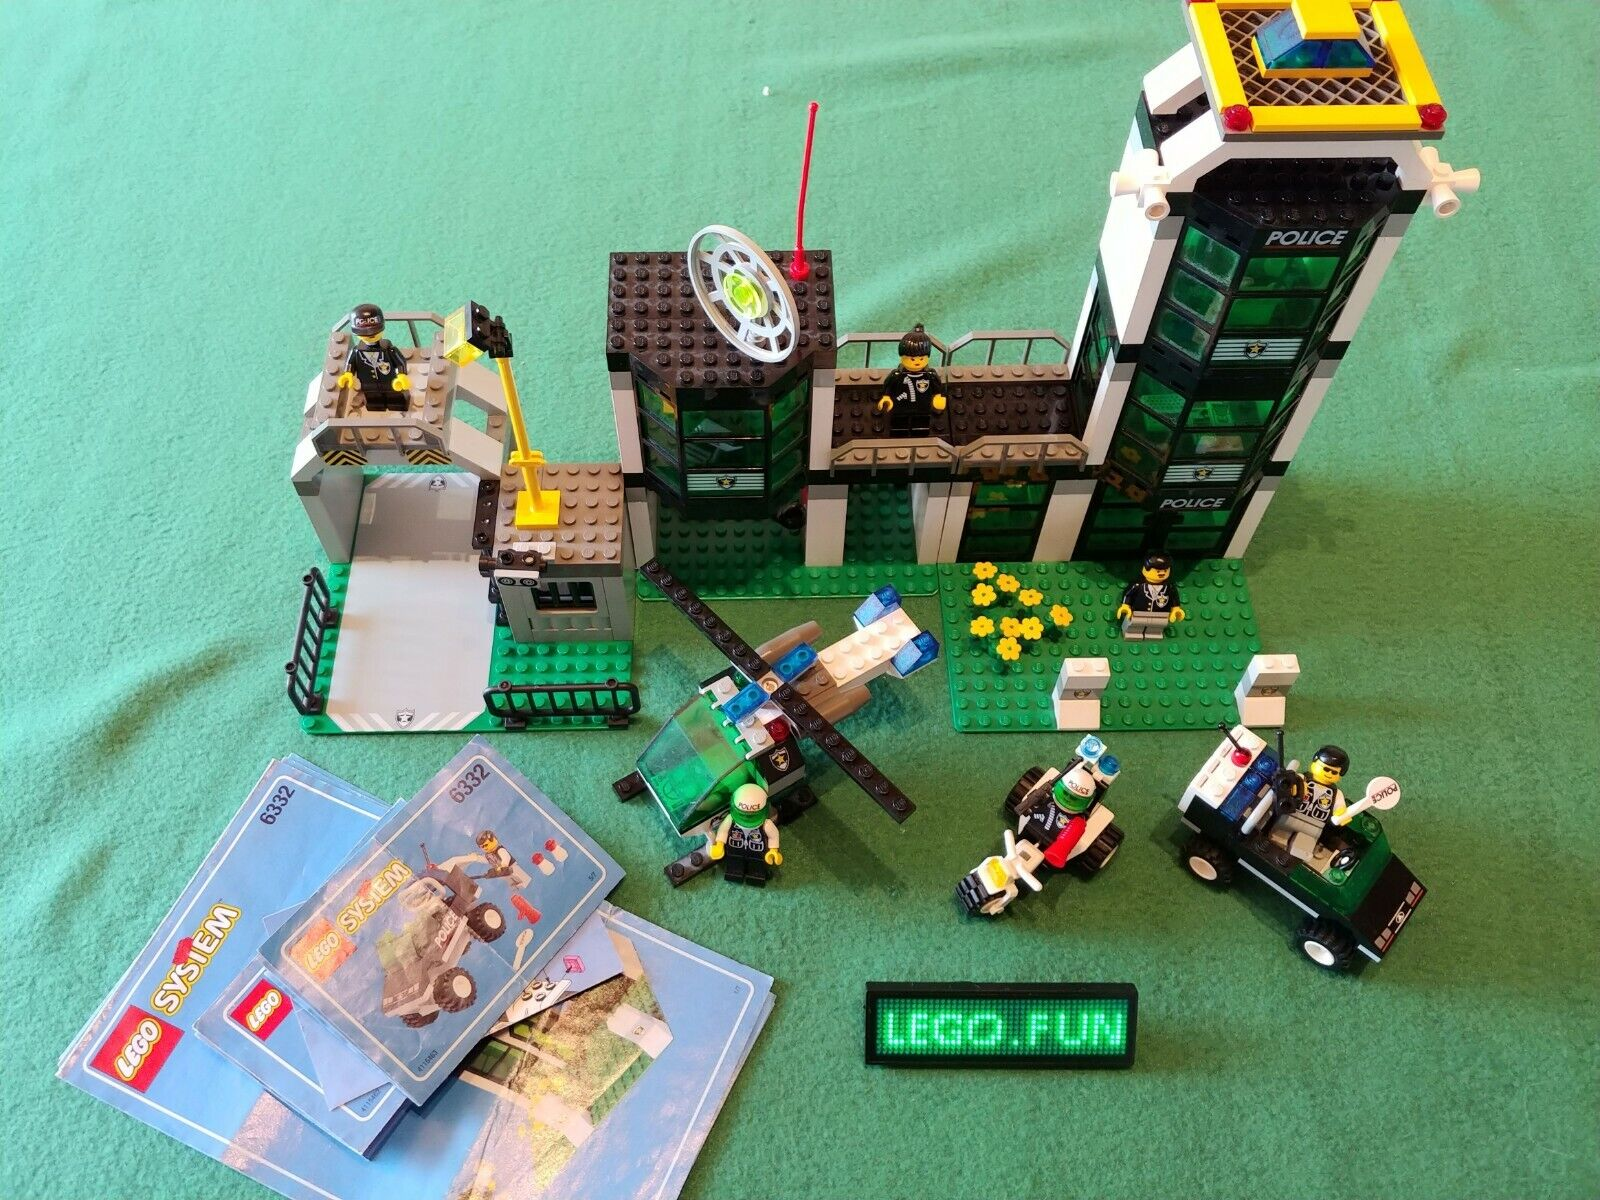 LEGO® 6332 große Polizei-Station +OBA   Police Command post central +Instr. City